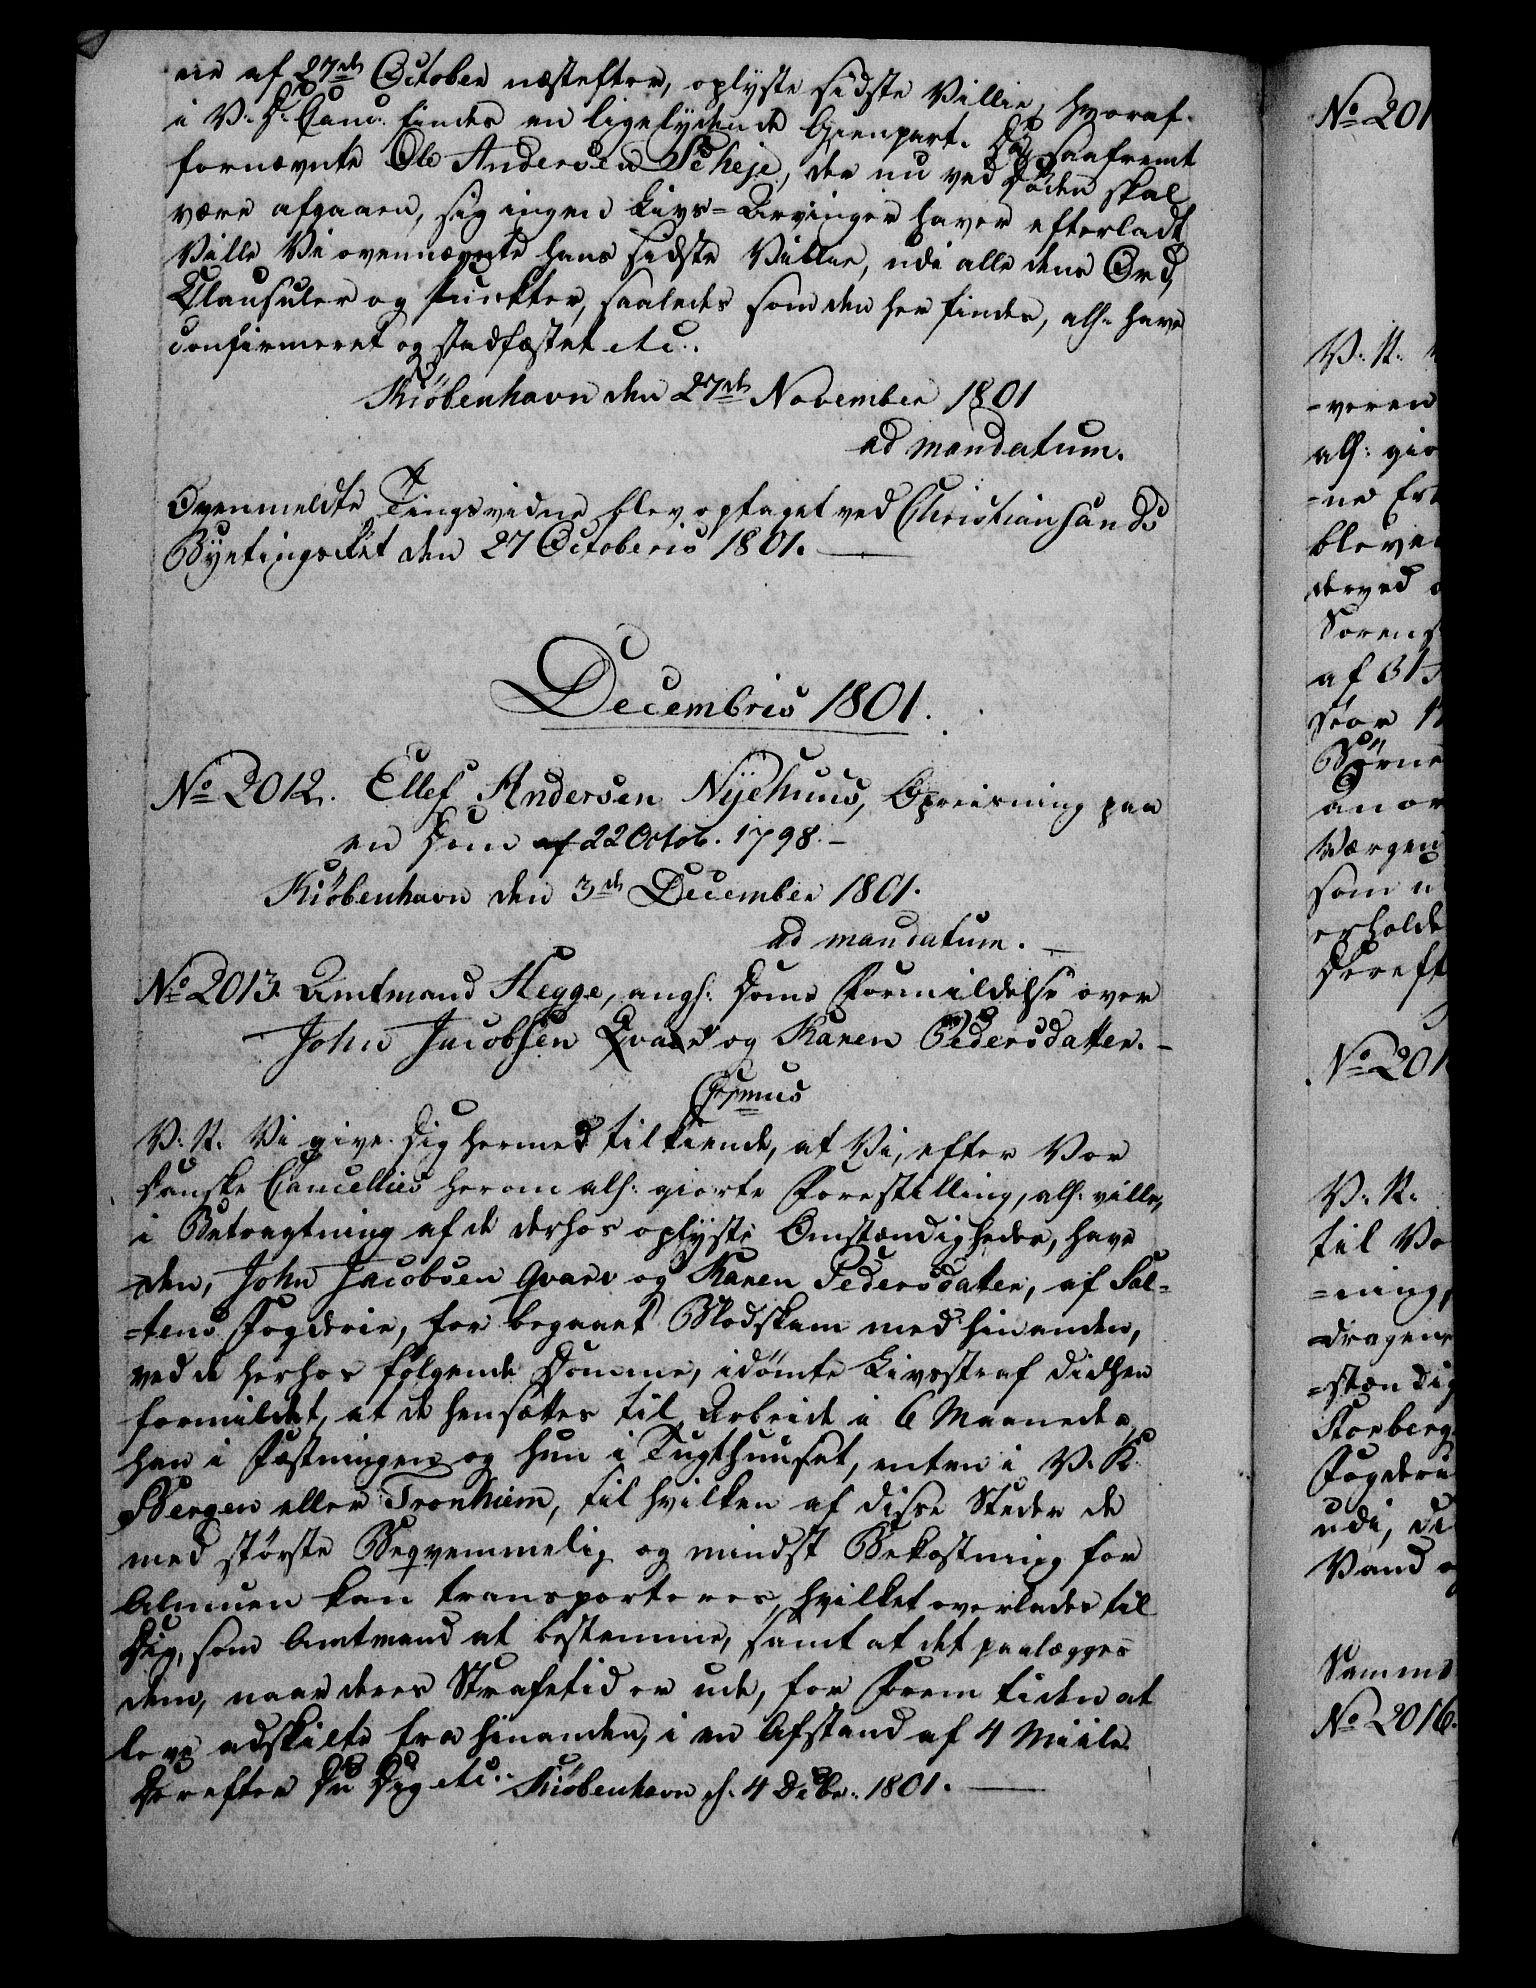 RA, Danske Kanselli 1800-1814, H/Hf/Hfb/Hfba/L0001: Registranter, 1800-1801, s. 452b